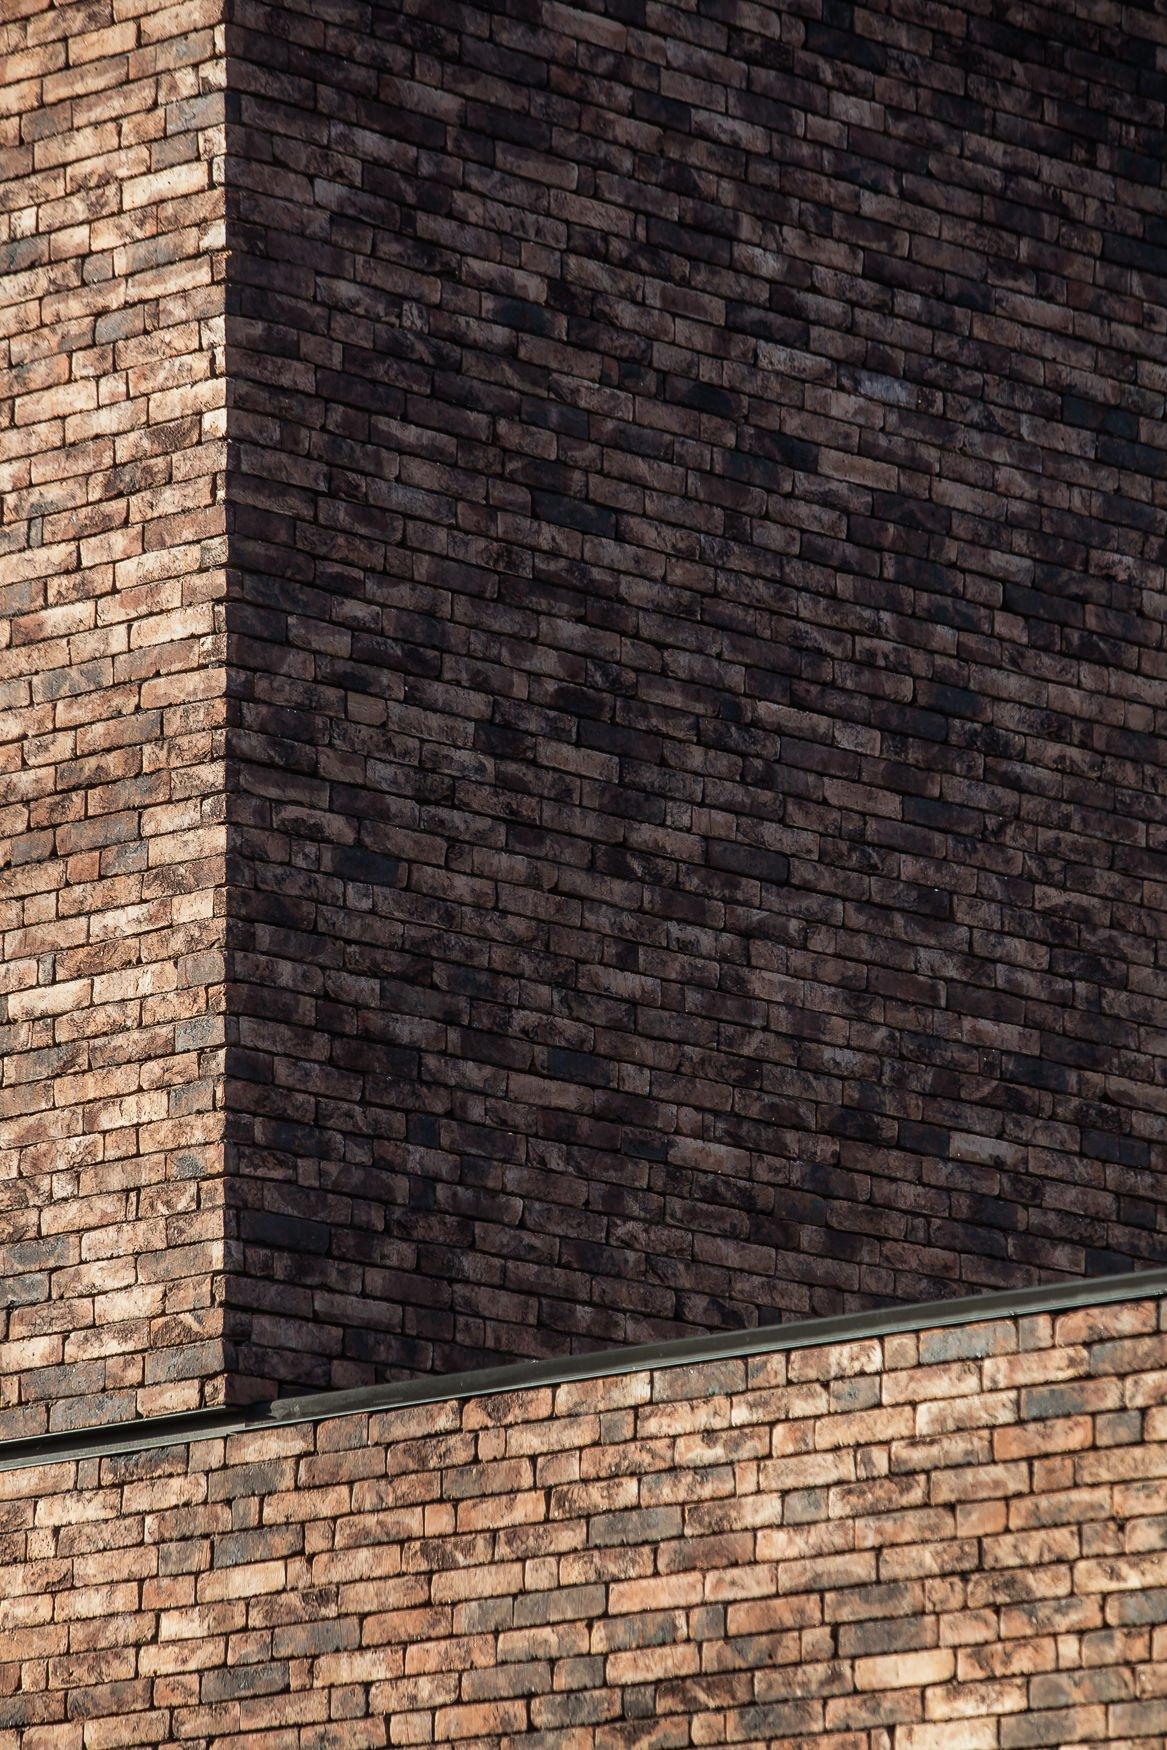 Detail of brick facade Thomas De Bruyne (Cafeine.be)